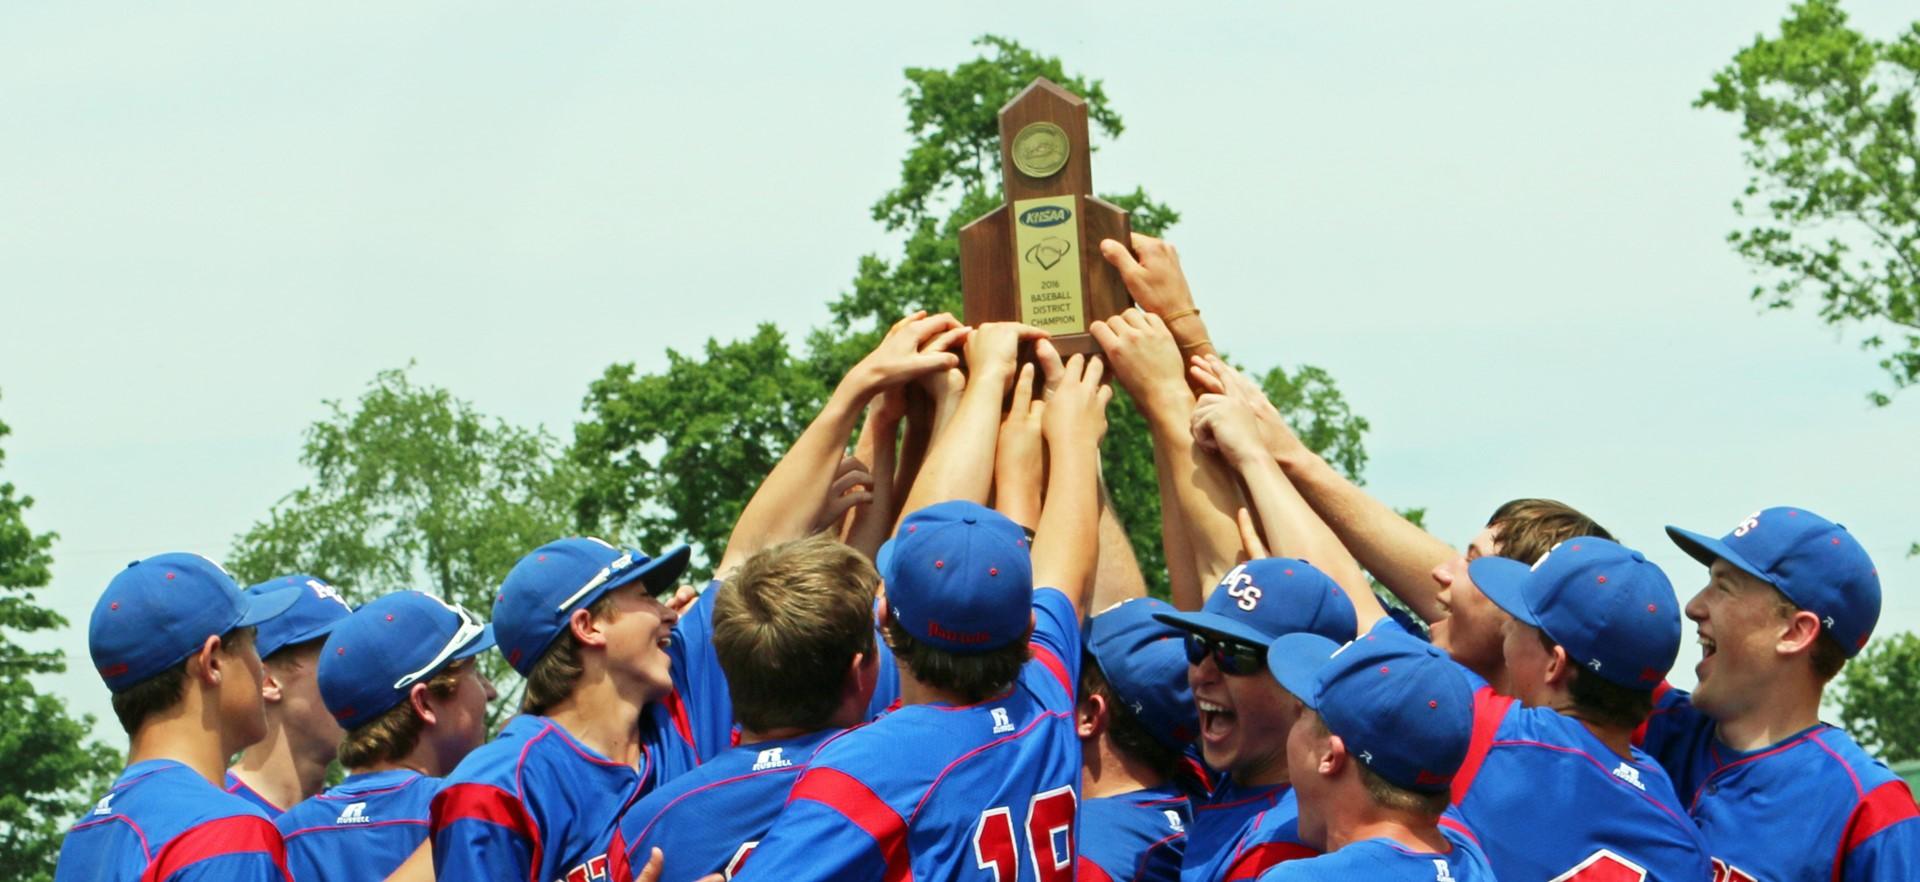 Patriot Baseball District Champions 2016